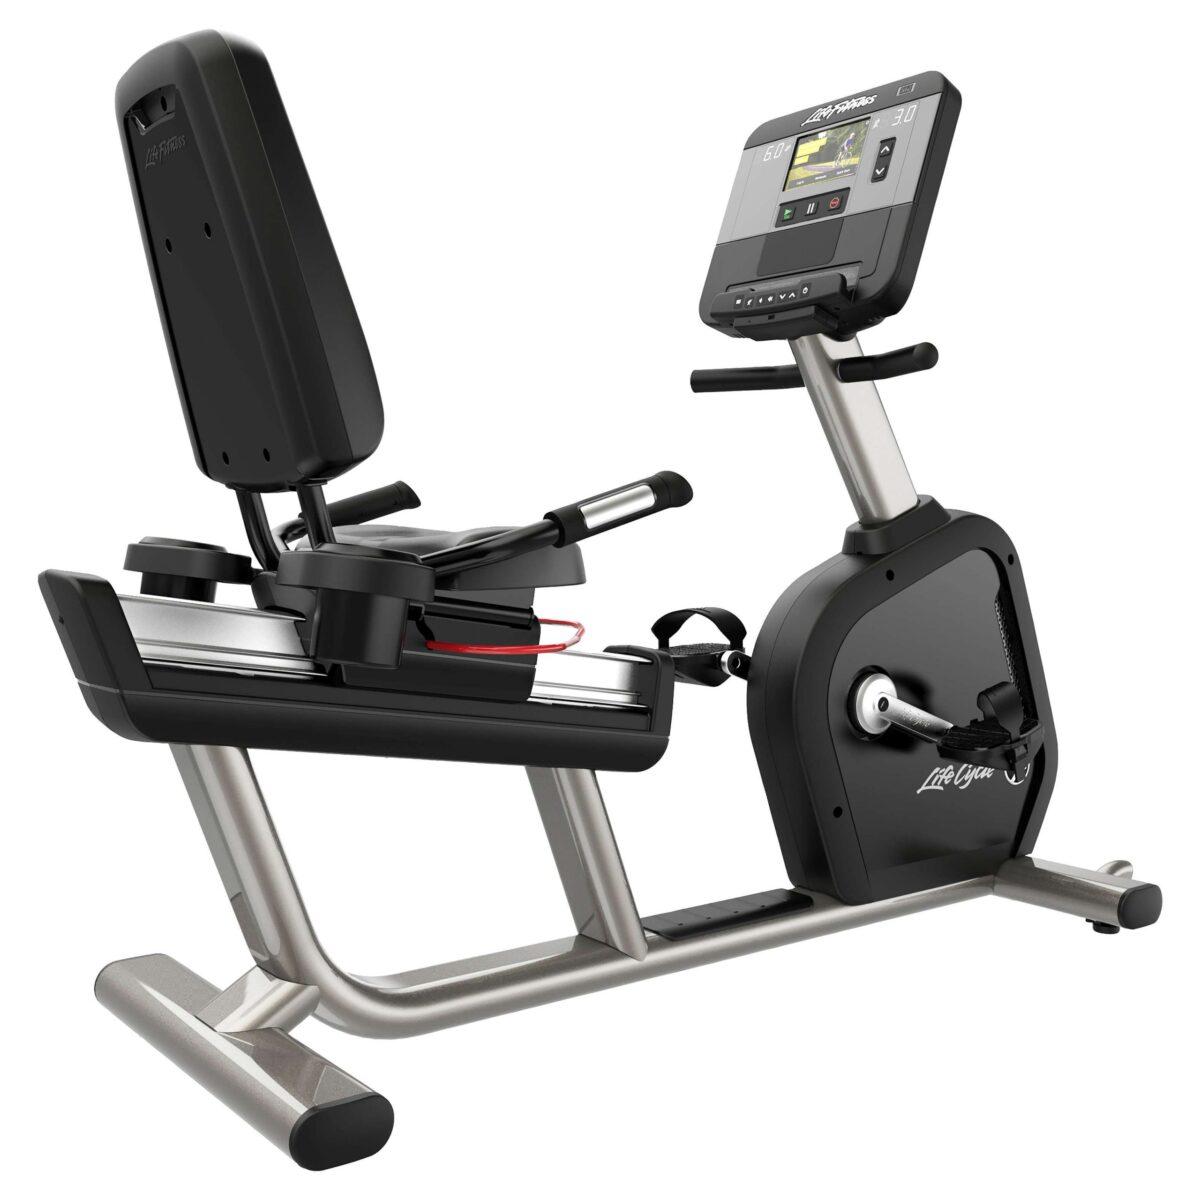 "Life Fitness Recumbent Bike ""Club Series+"" - Fitnessgeräte - Life Fitness"